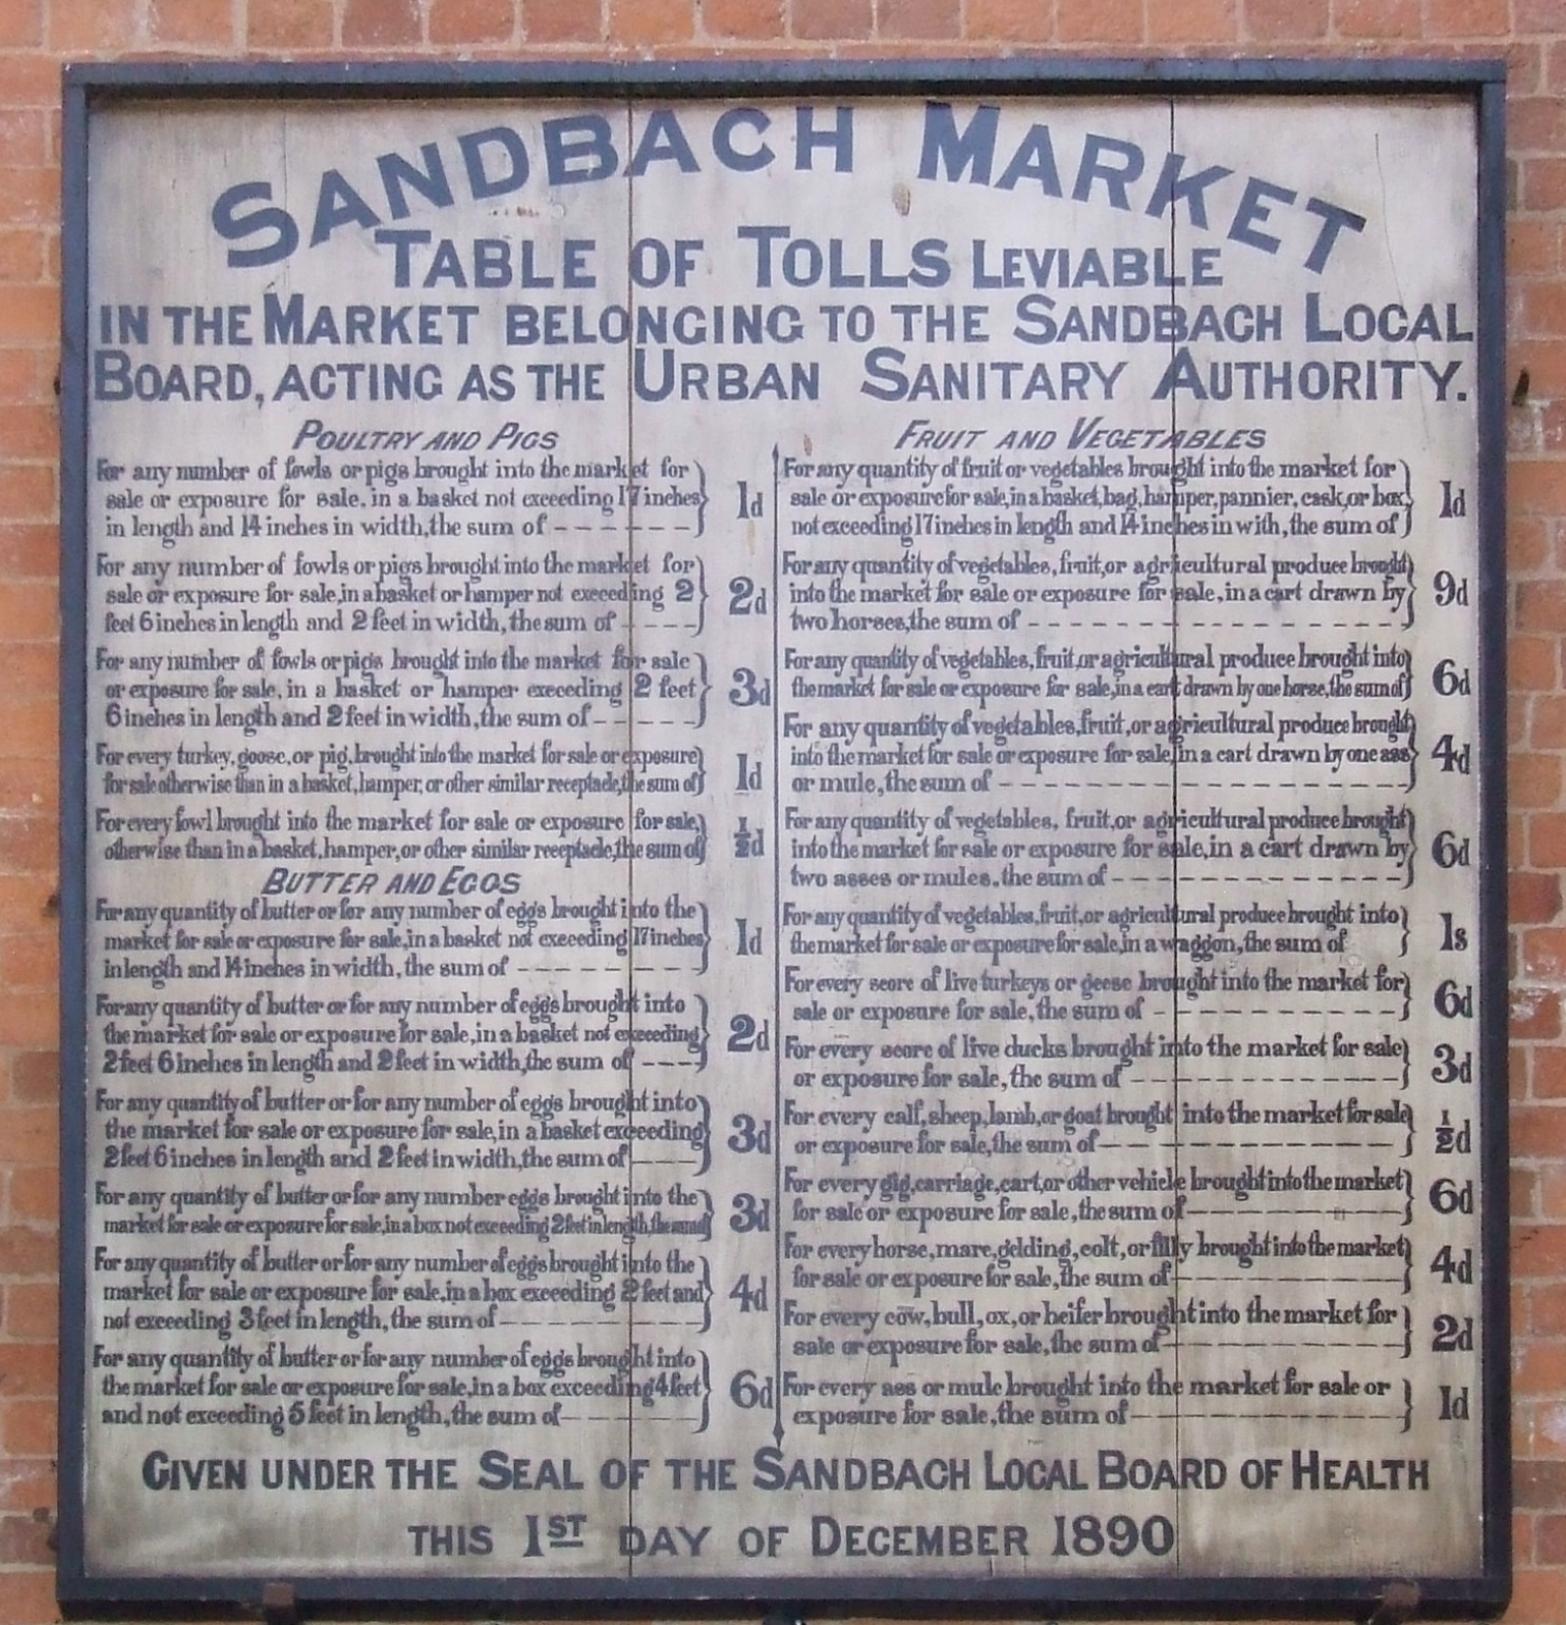 - Thursday Charter Market 8am-4pm Sandbach Town Centre and Market Hall Friday Market9am-2pm Sandbach Market Hall OnlySaturday Market 8am-4pm In and around the Market Hall